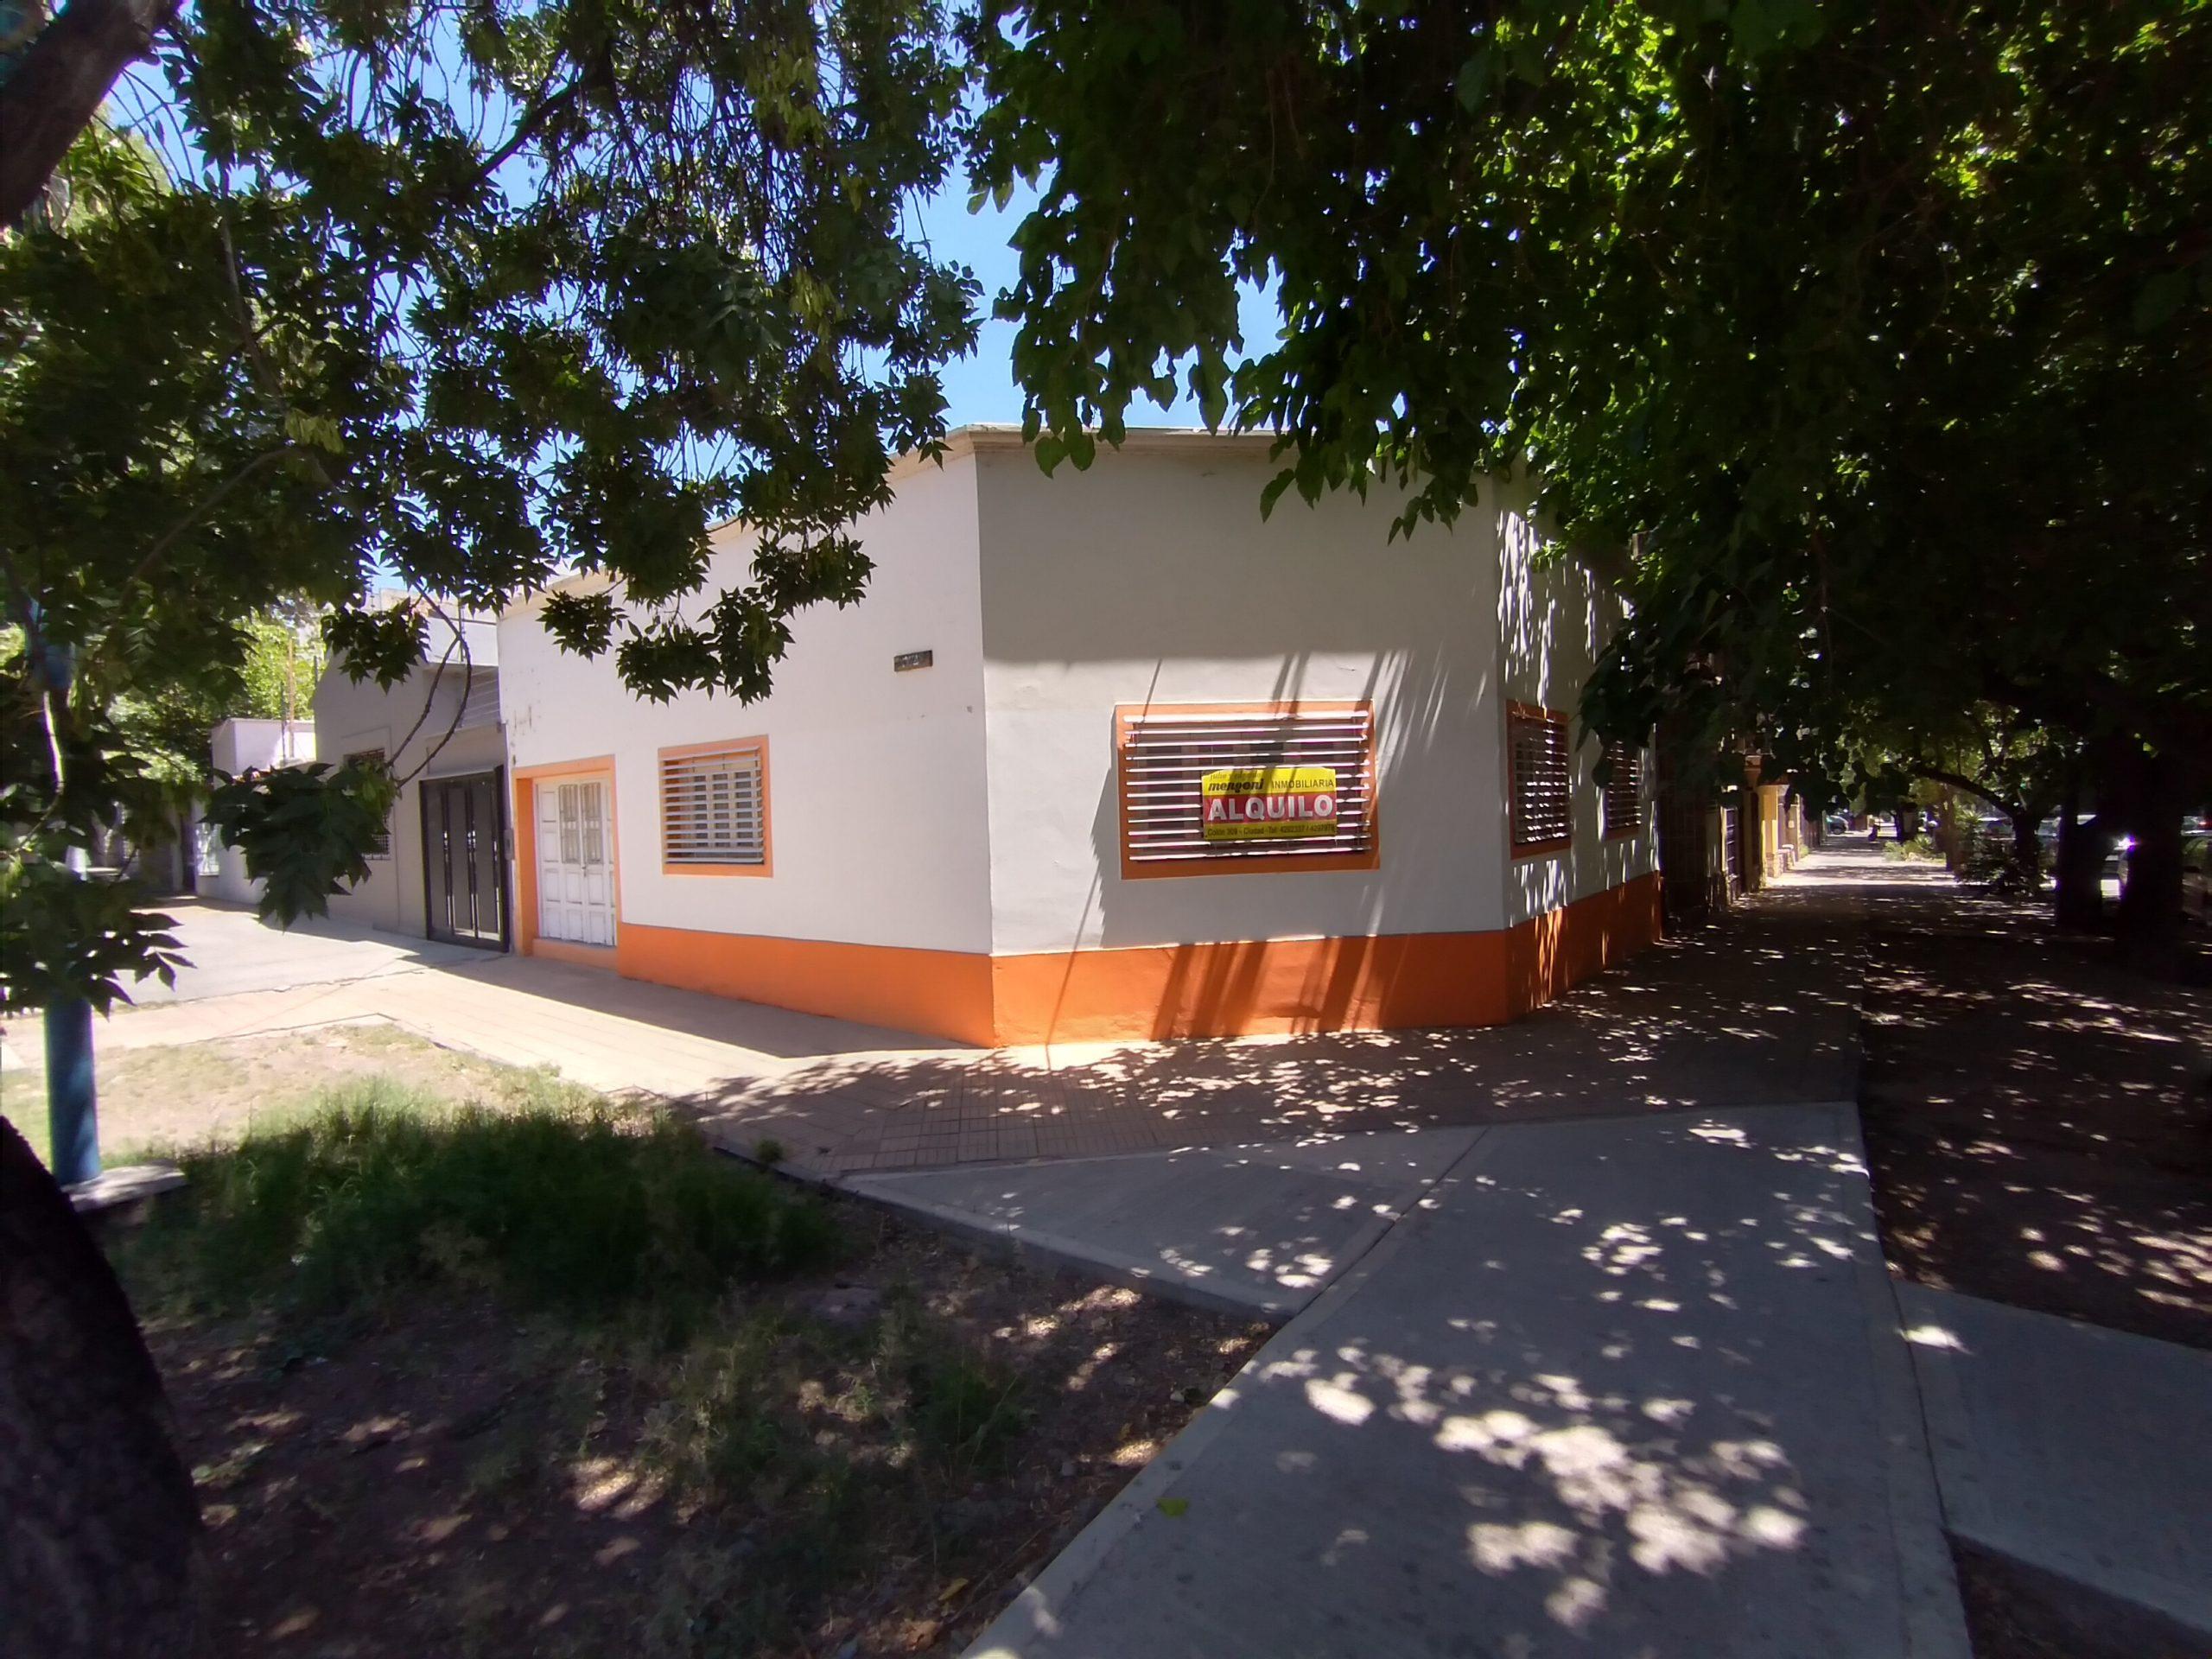 Local Esquina en B° Bombal a 3 cuadras de Av. San Martín – Ideal uso Gimnasio – Fitness -Administrativo – Comercial –  Calle Echeverría y Arizu, Godoy Cruz.-